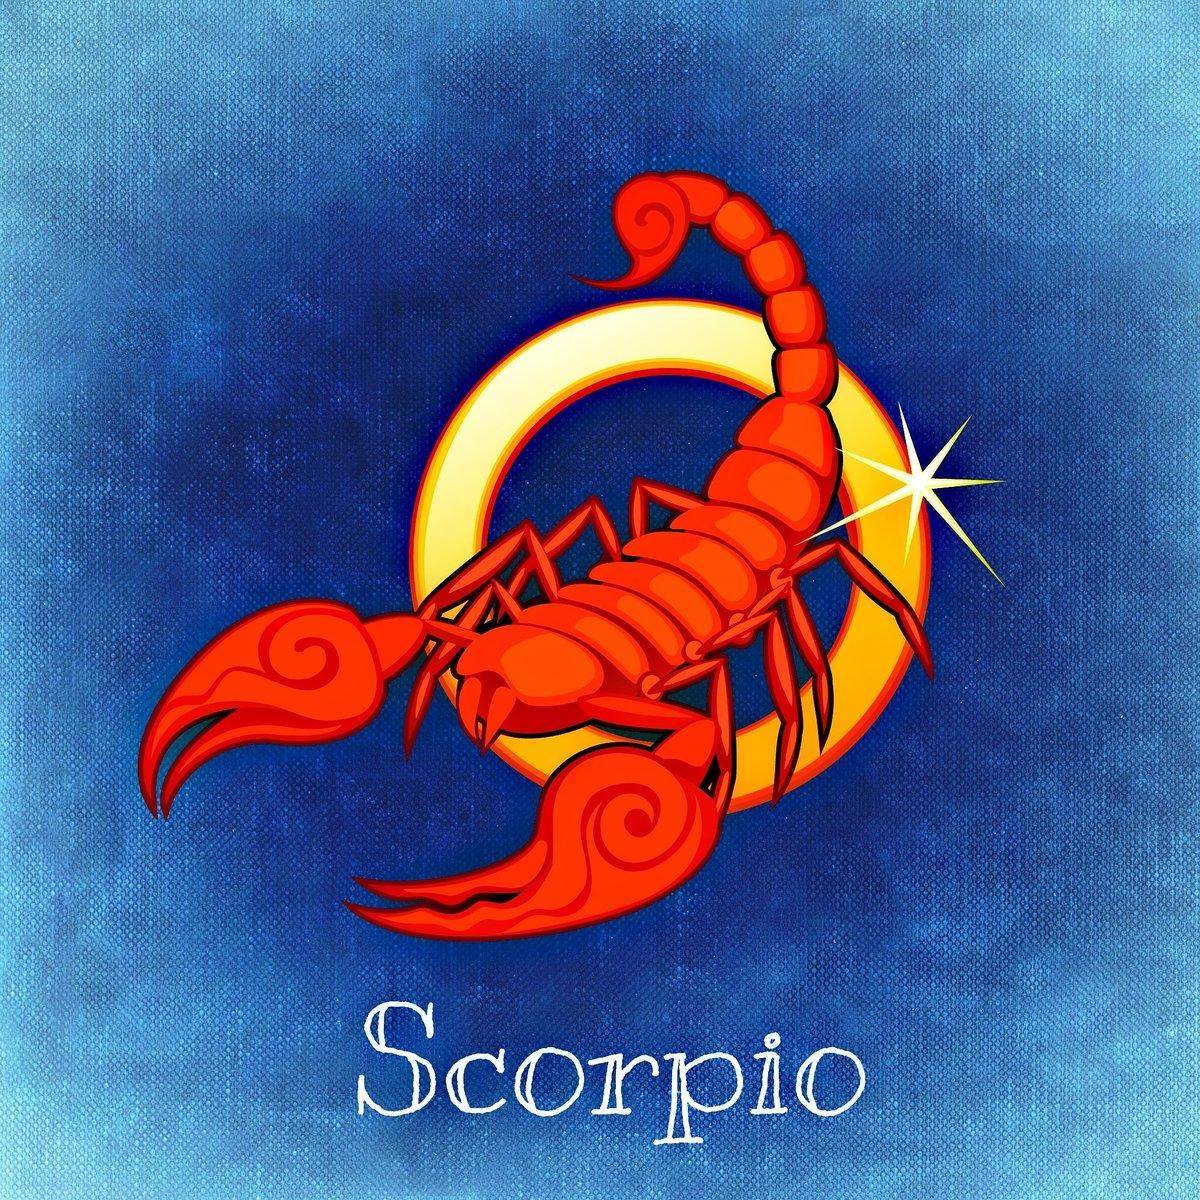 Скорпион 24.10 - 22.11 – подробный гороскоп знака зодиака